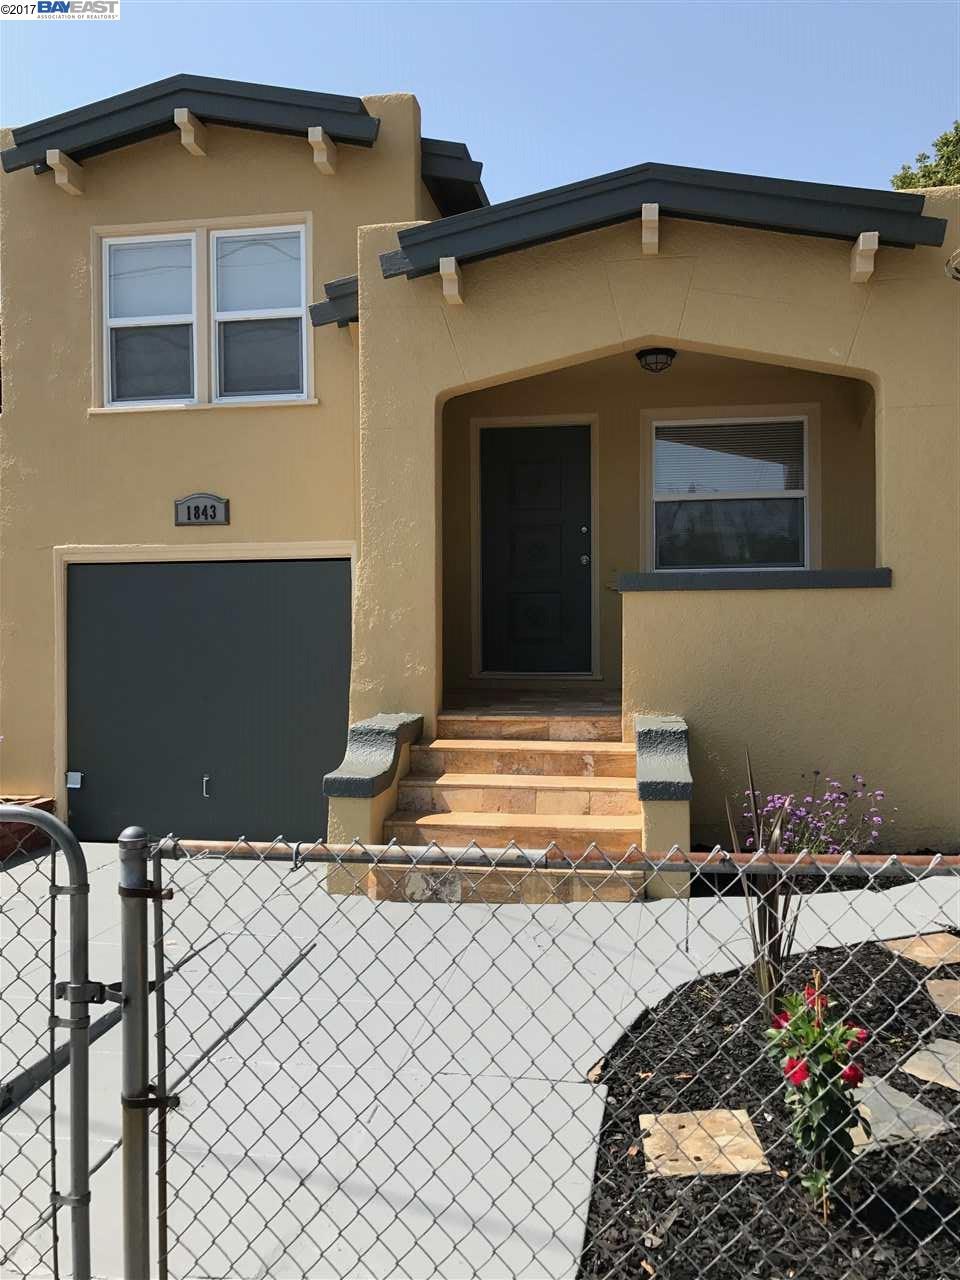 1843 66th Ave, OAKLAND, CA 94621